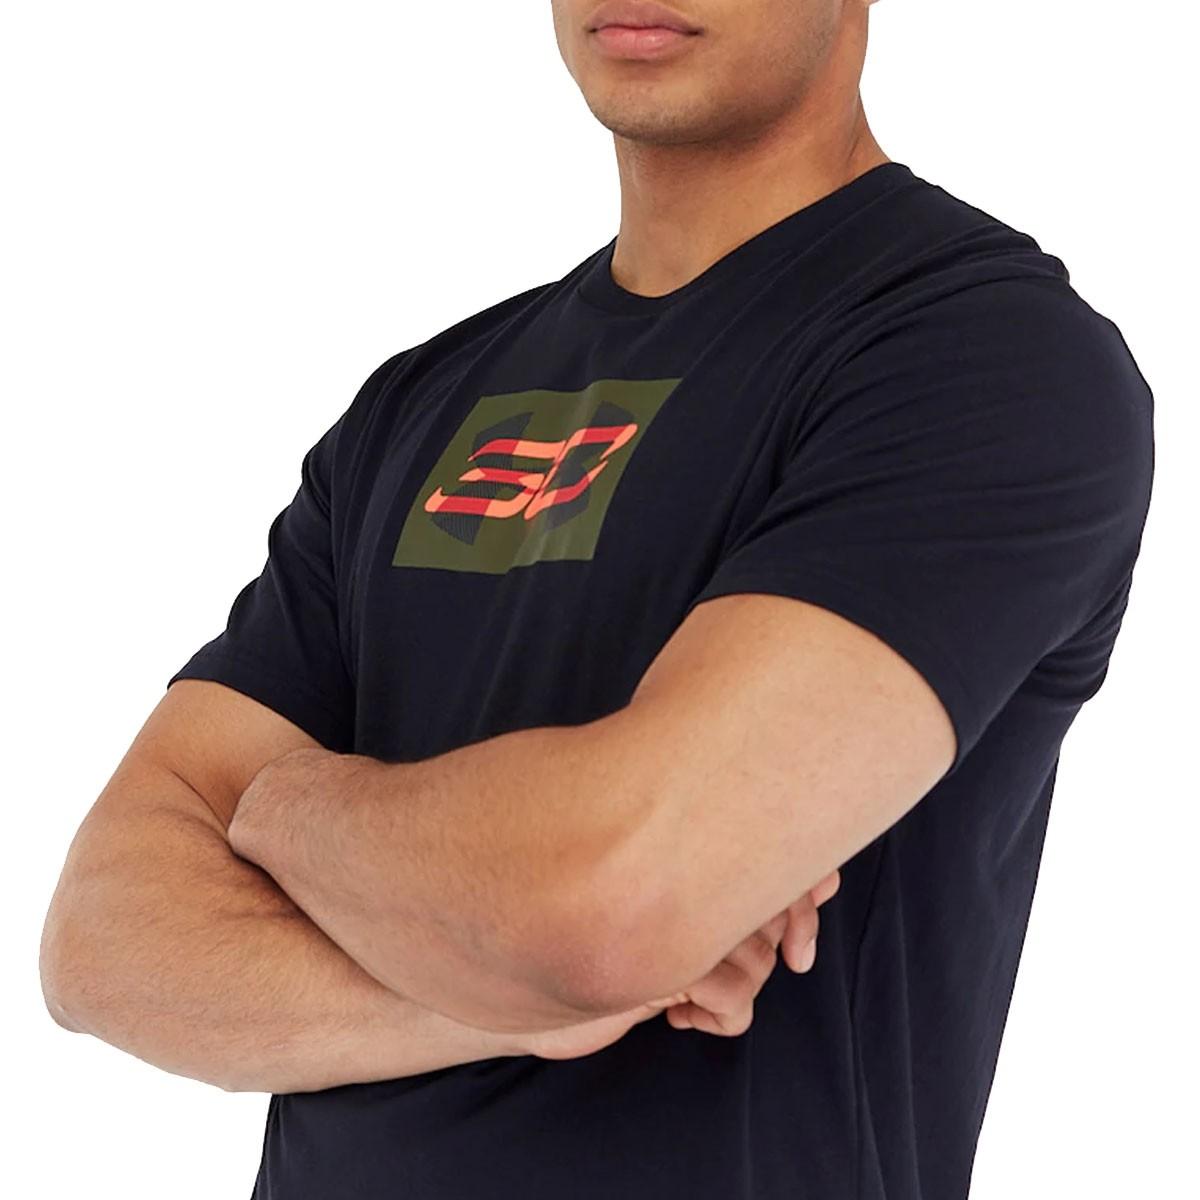 Under Armour SC30 Overlay Short Sleeve T-Shirt 'Black' 1342987-001